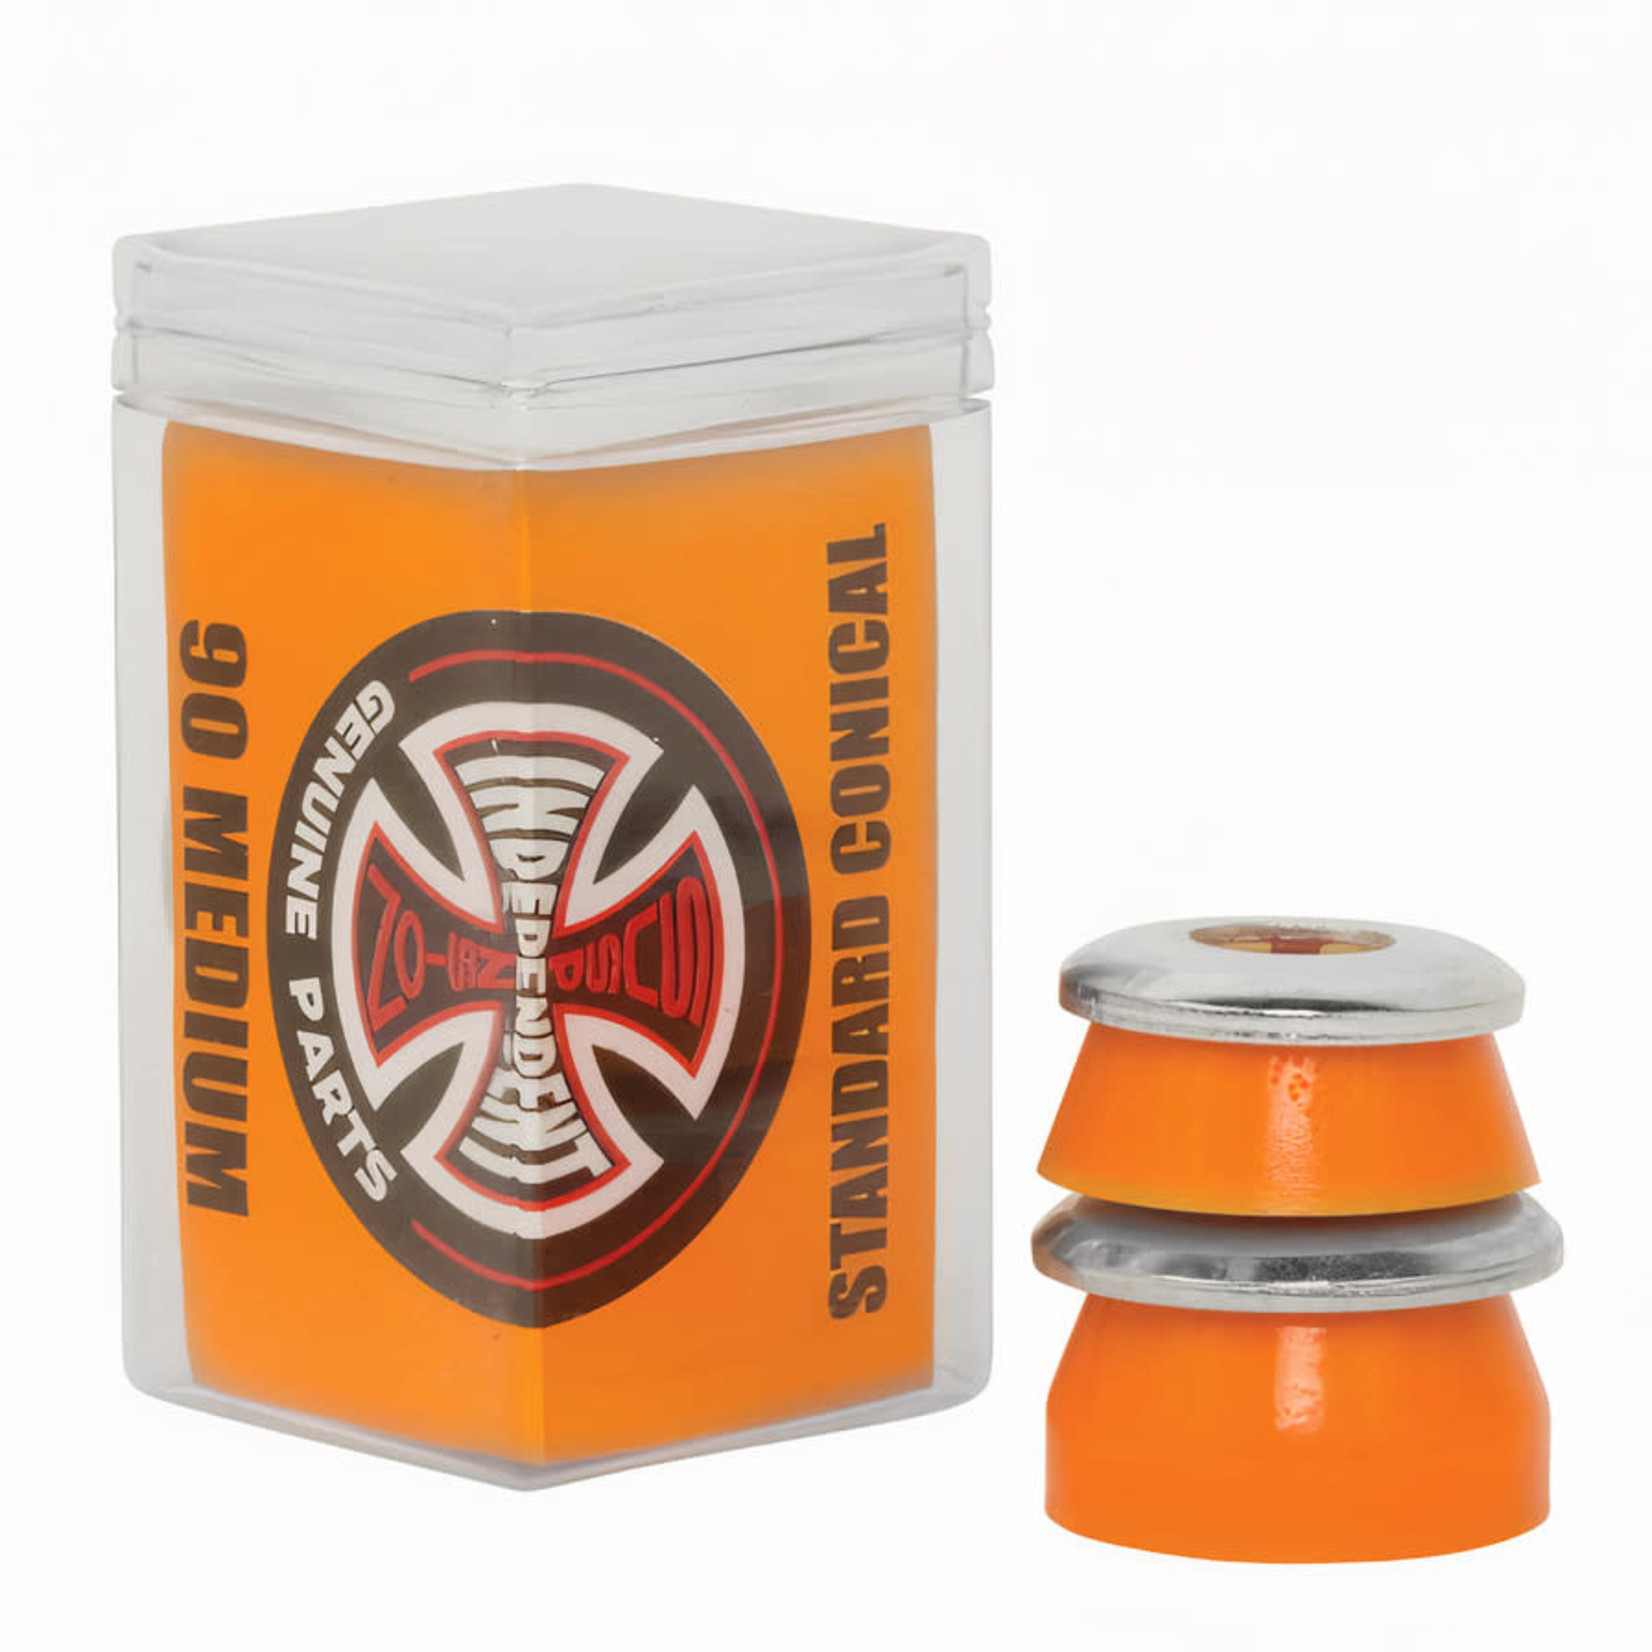 Independent Independent - Standard Conical Bushings - Medium Orange 90